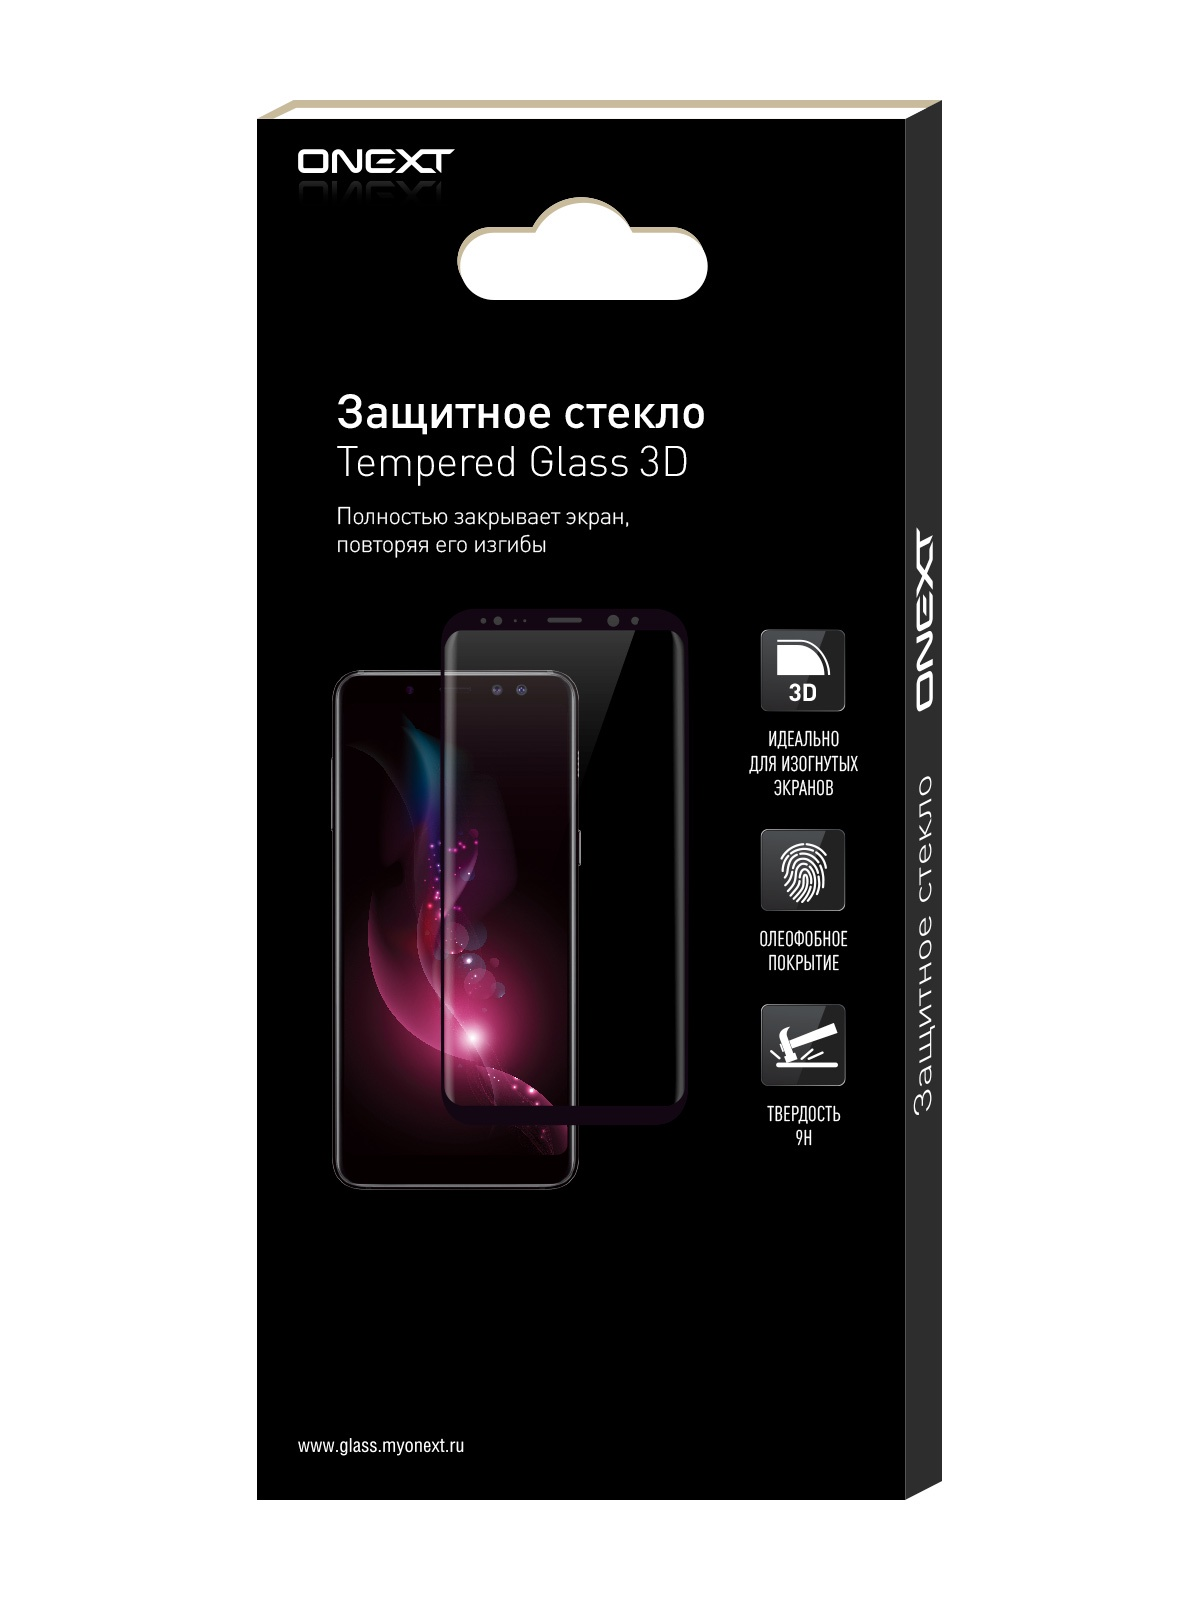 Защитное стекло ONEXT Samsung Galaxy J4 2018, 3D защитное стекло для samsung galaxy j4 2018 sm j400 onext